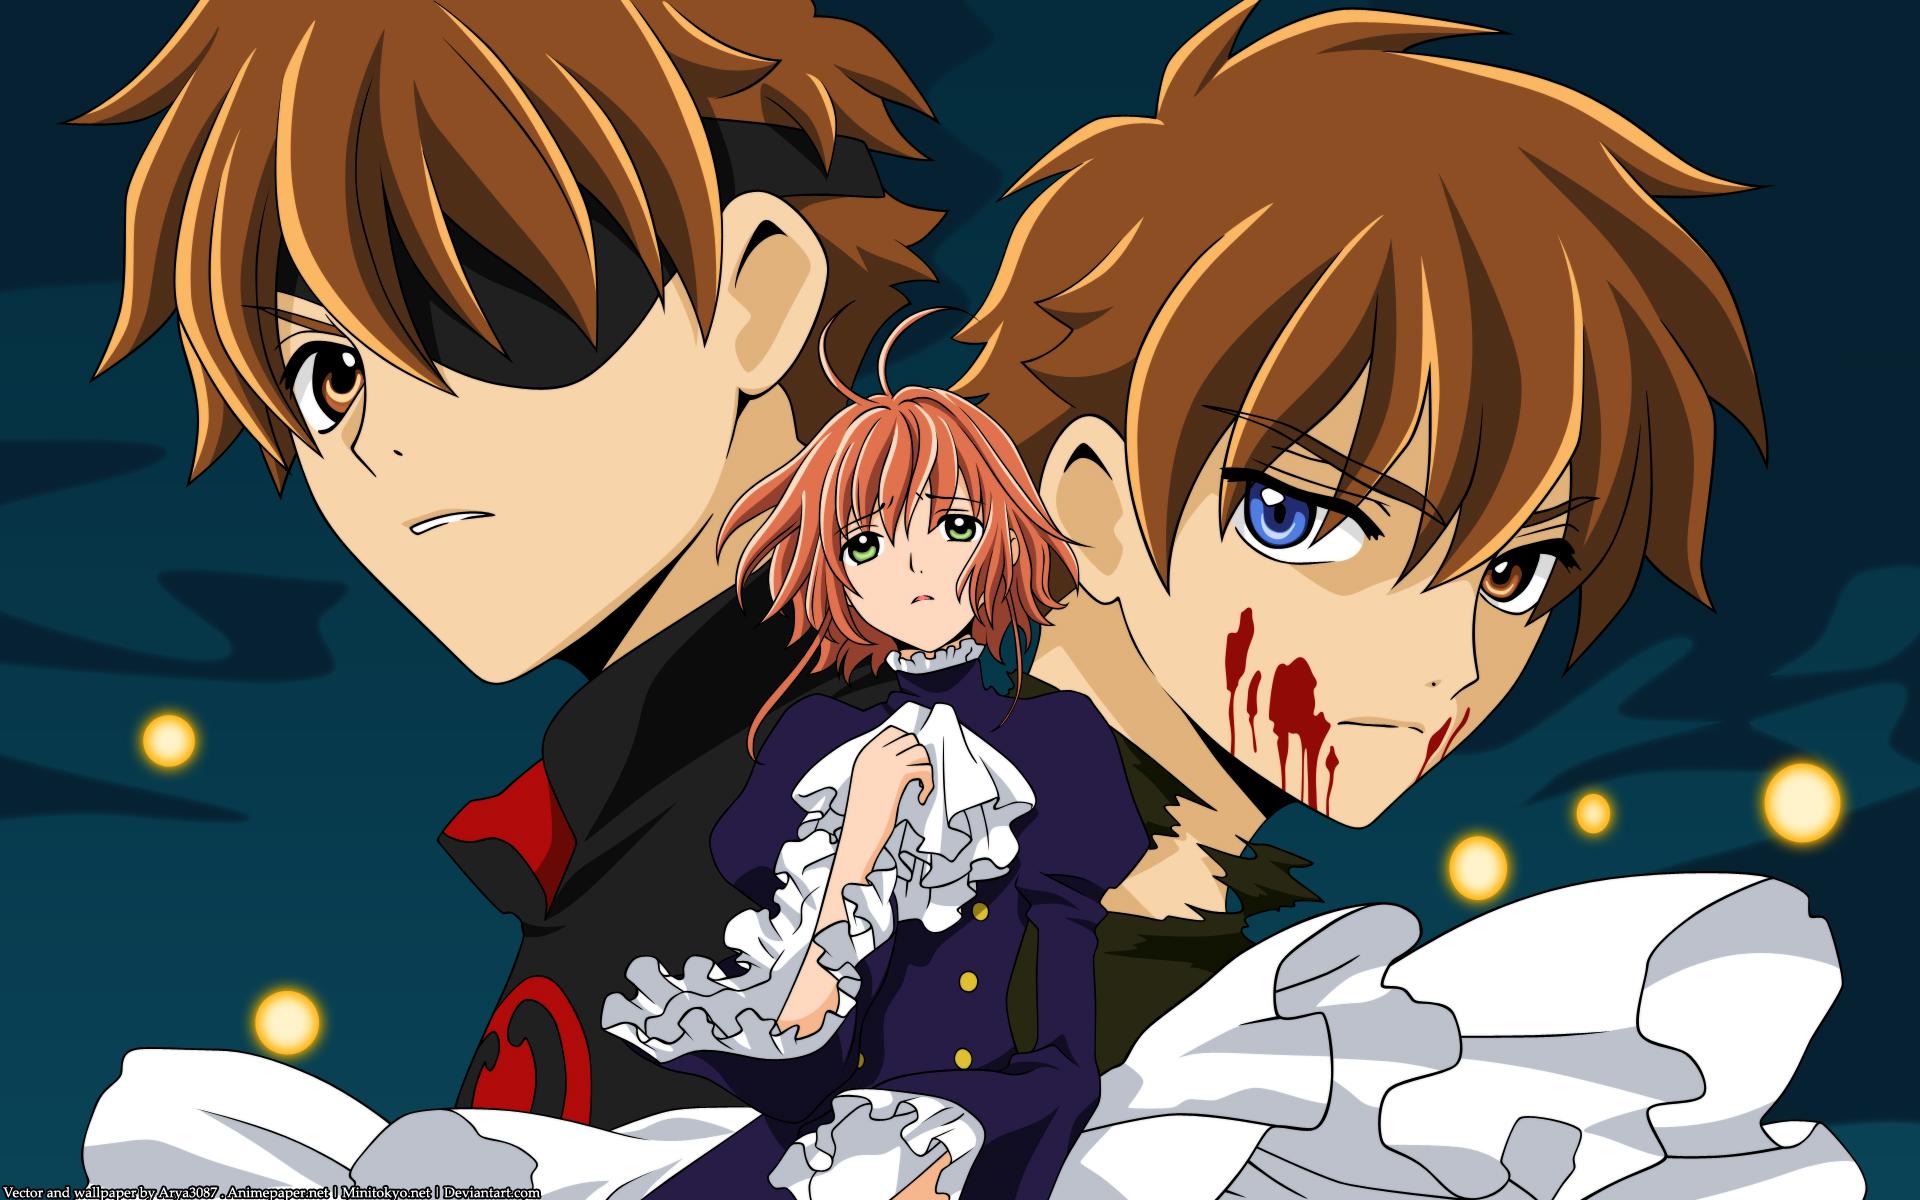 Li Syaoran (TRC) - Tsubasa: RESERVoir CHRoNiCLE - Zerochan Anime Image Board